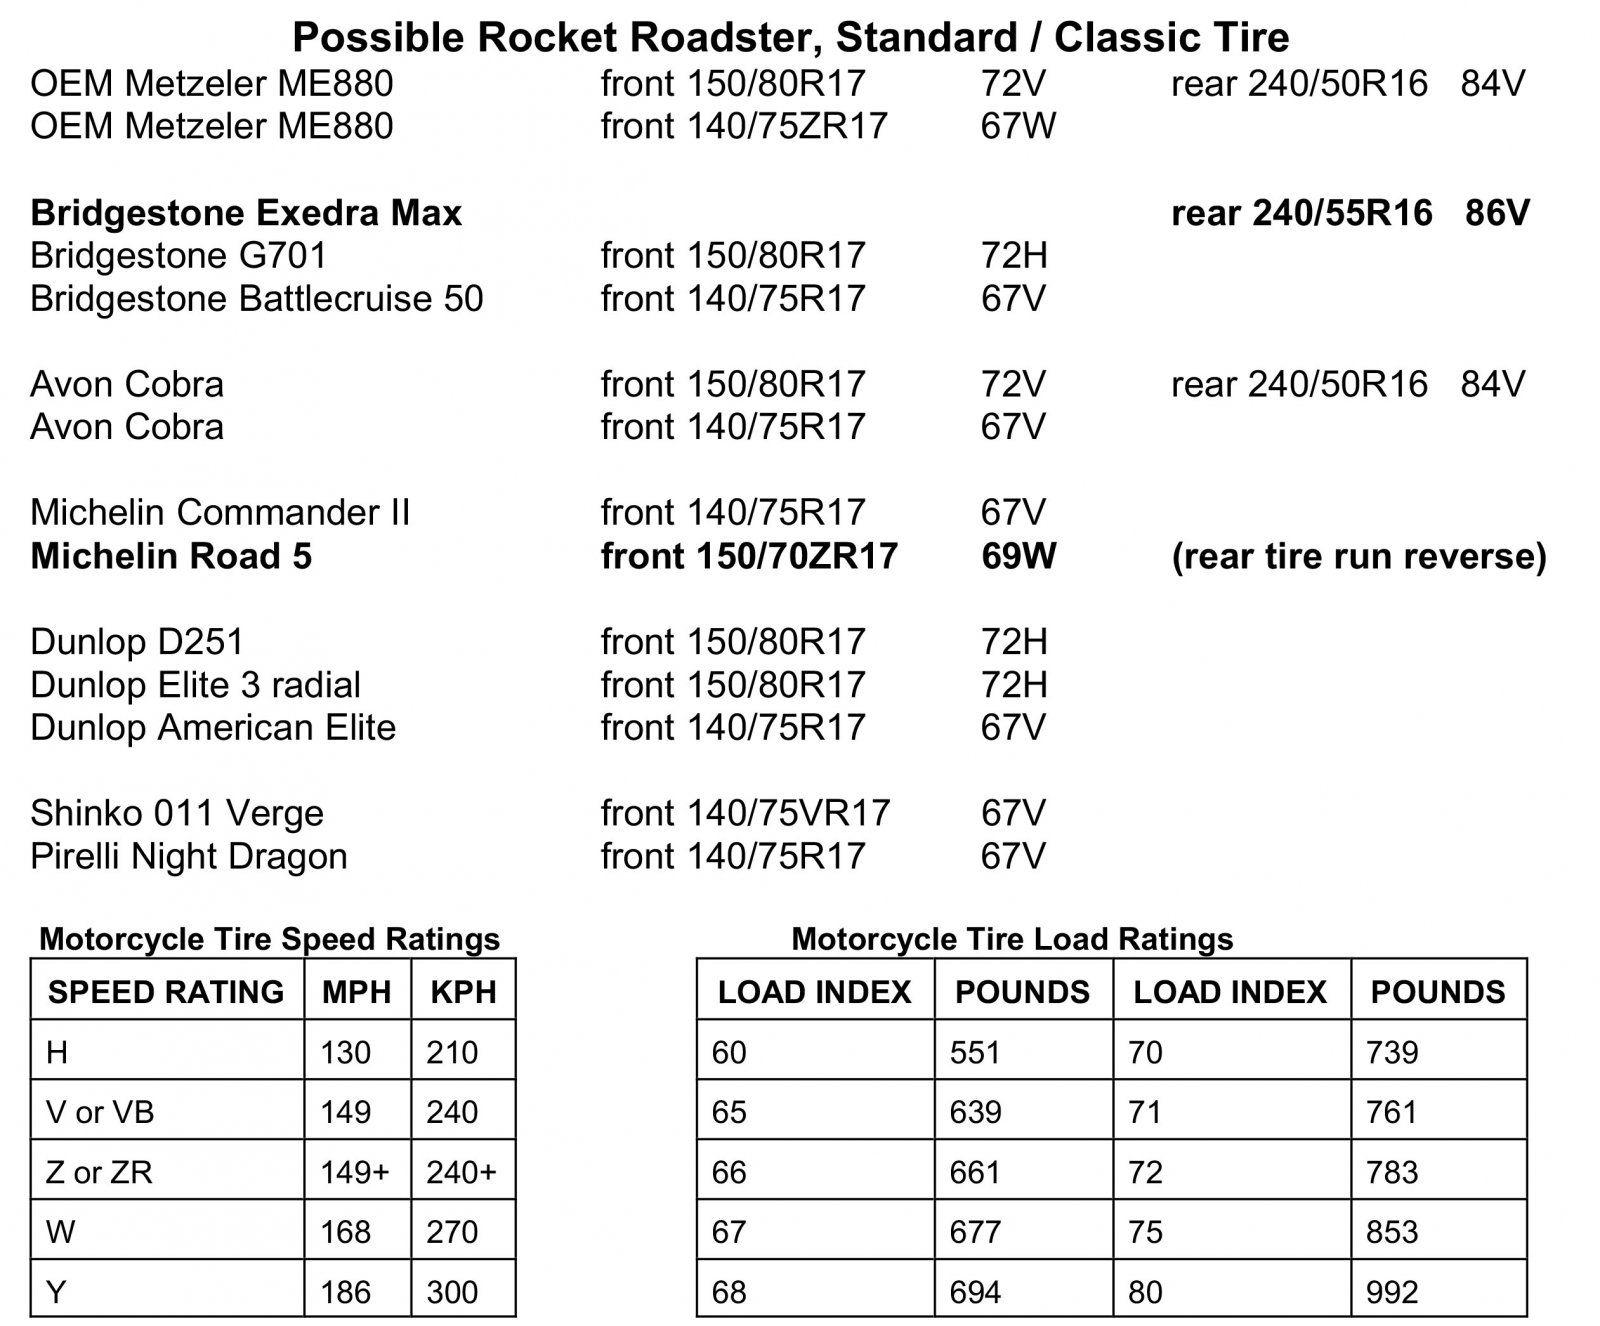 Tires_Possible Rocket Roadster.jpg